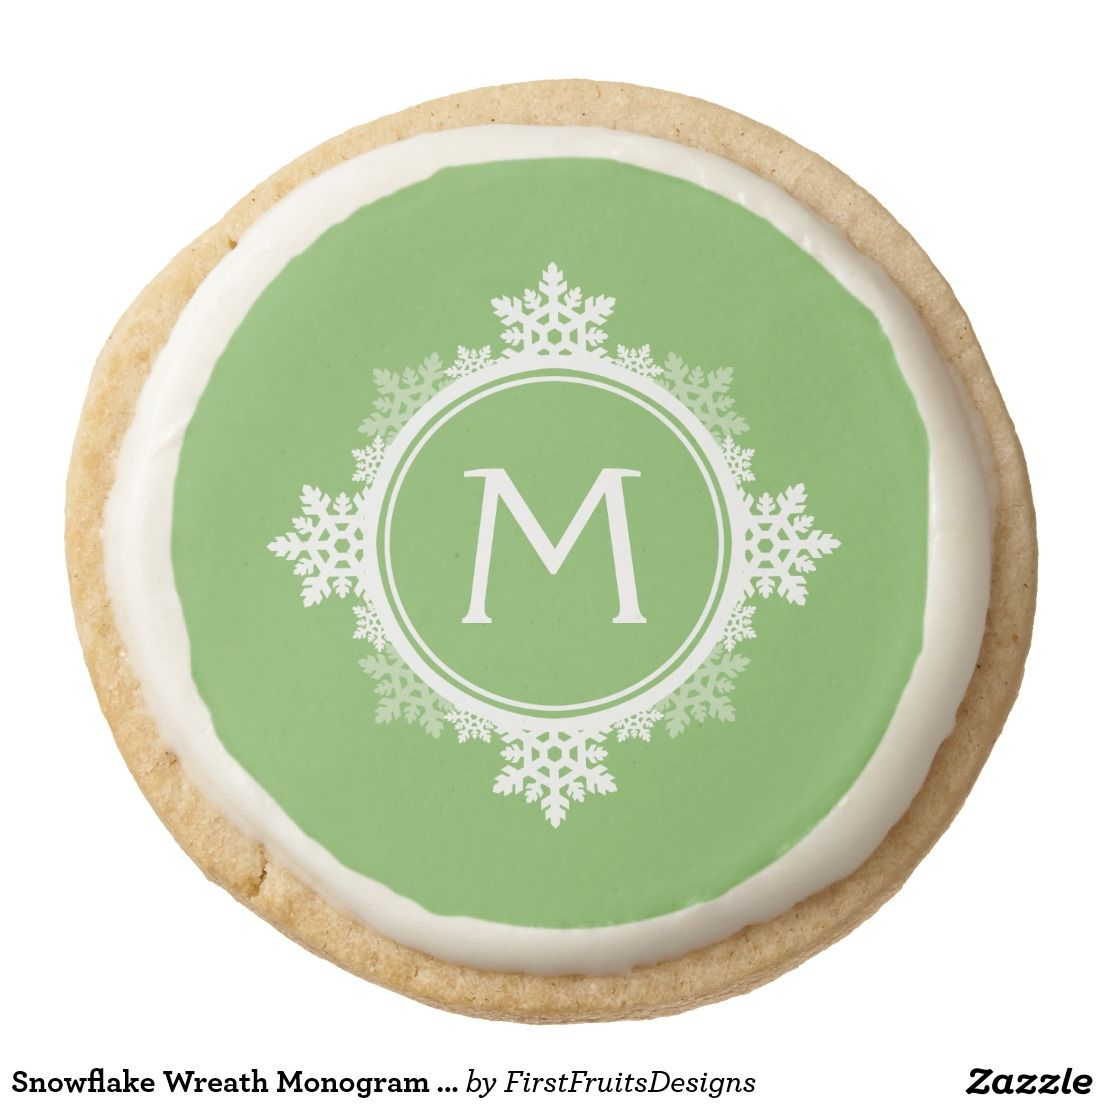 Snowflake Wreath Monogram in Lime Green & White Round Shortbread Cookie